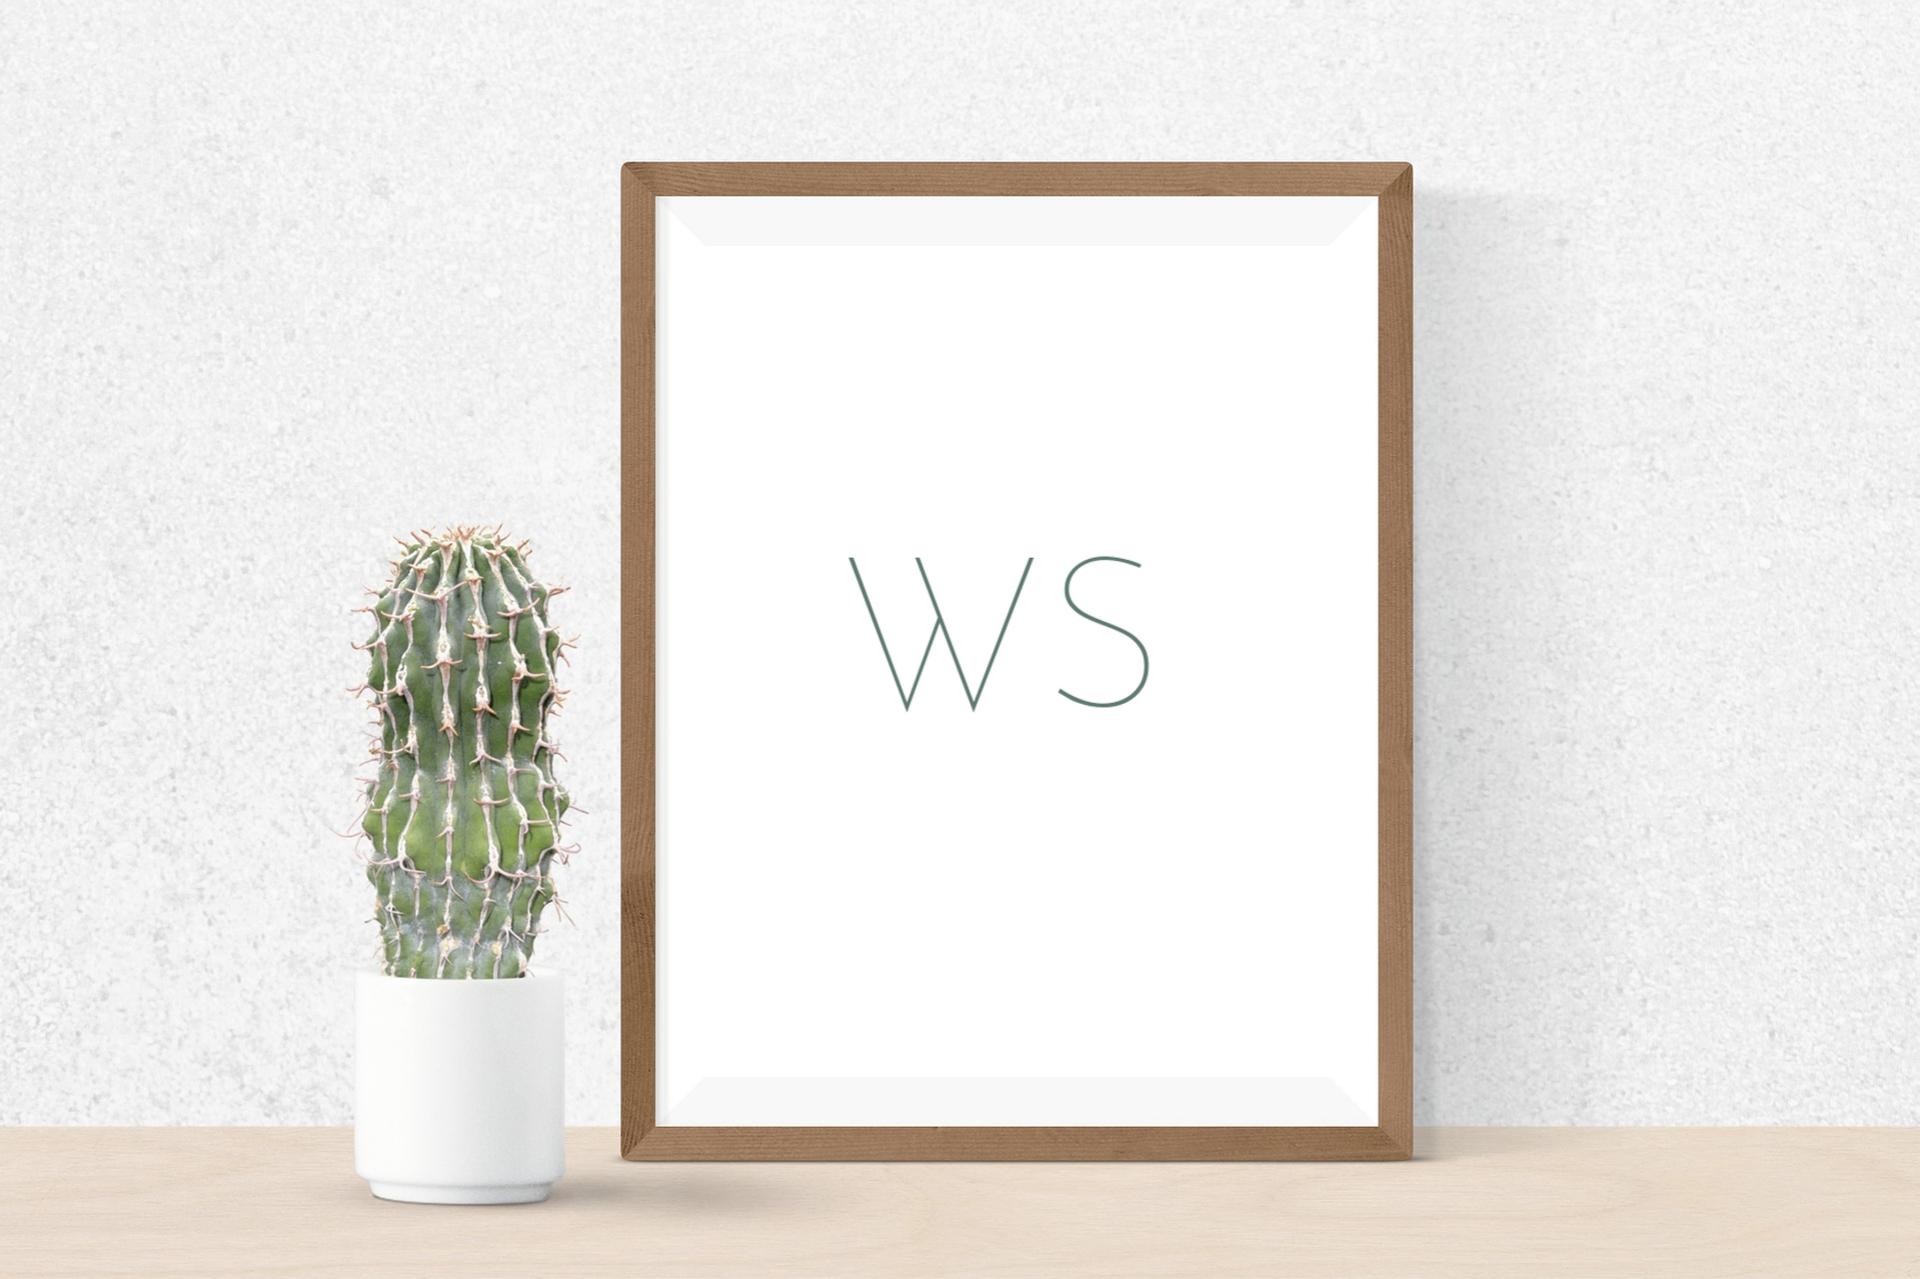 Branding WS - Whitney Stokes Design